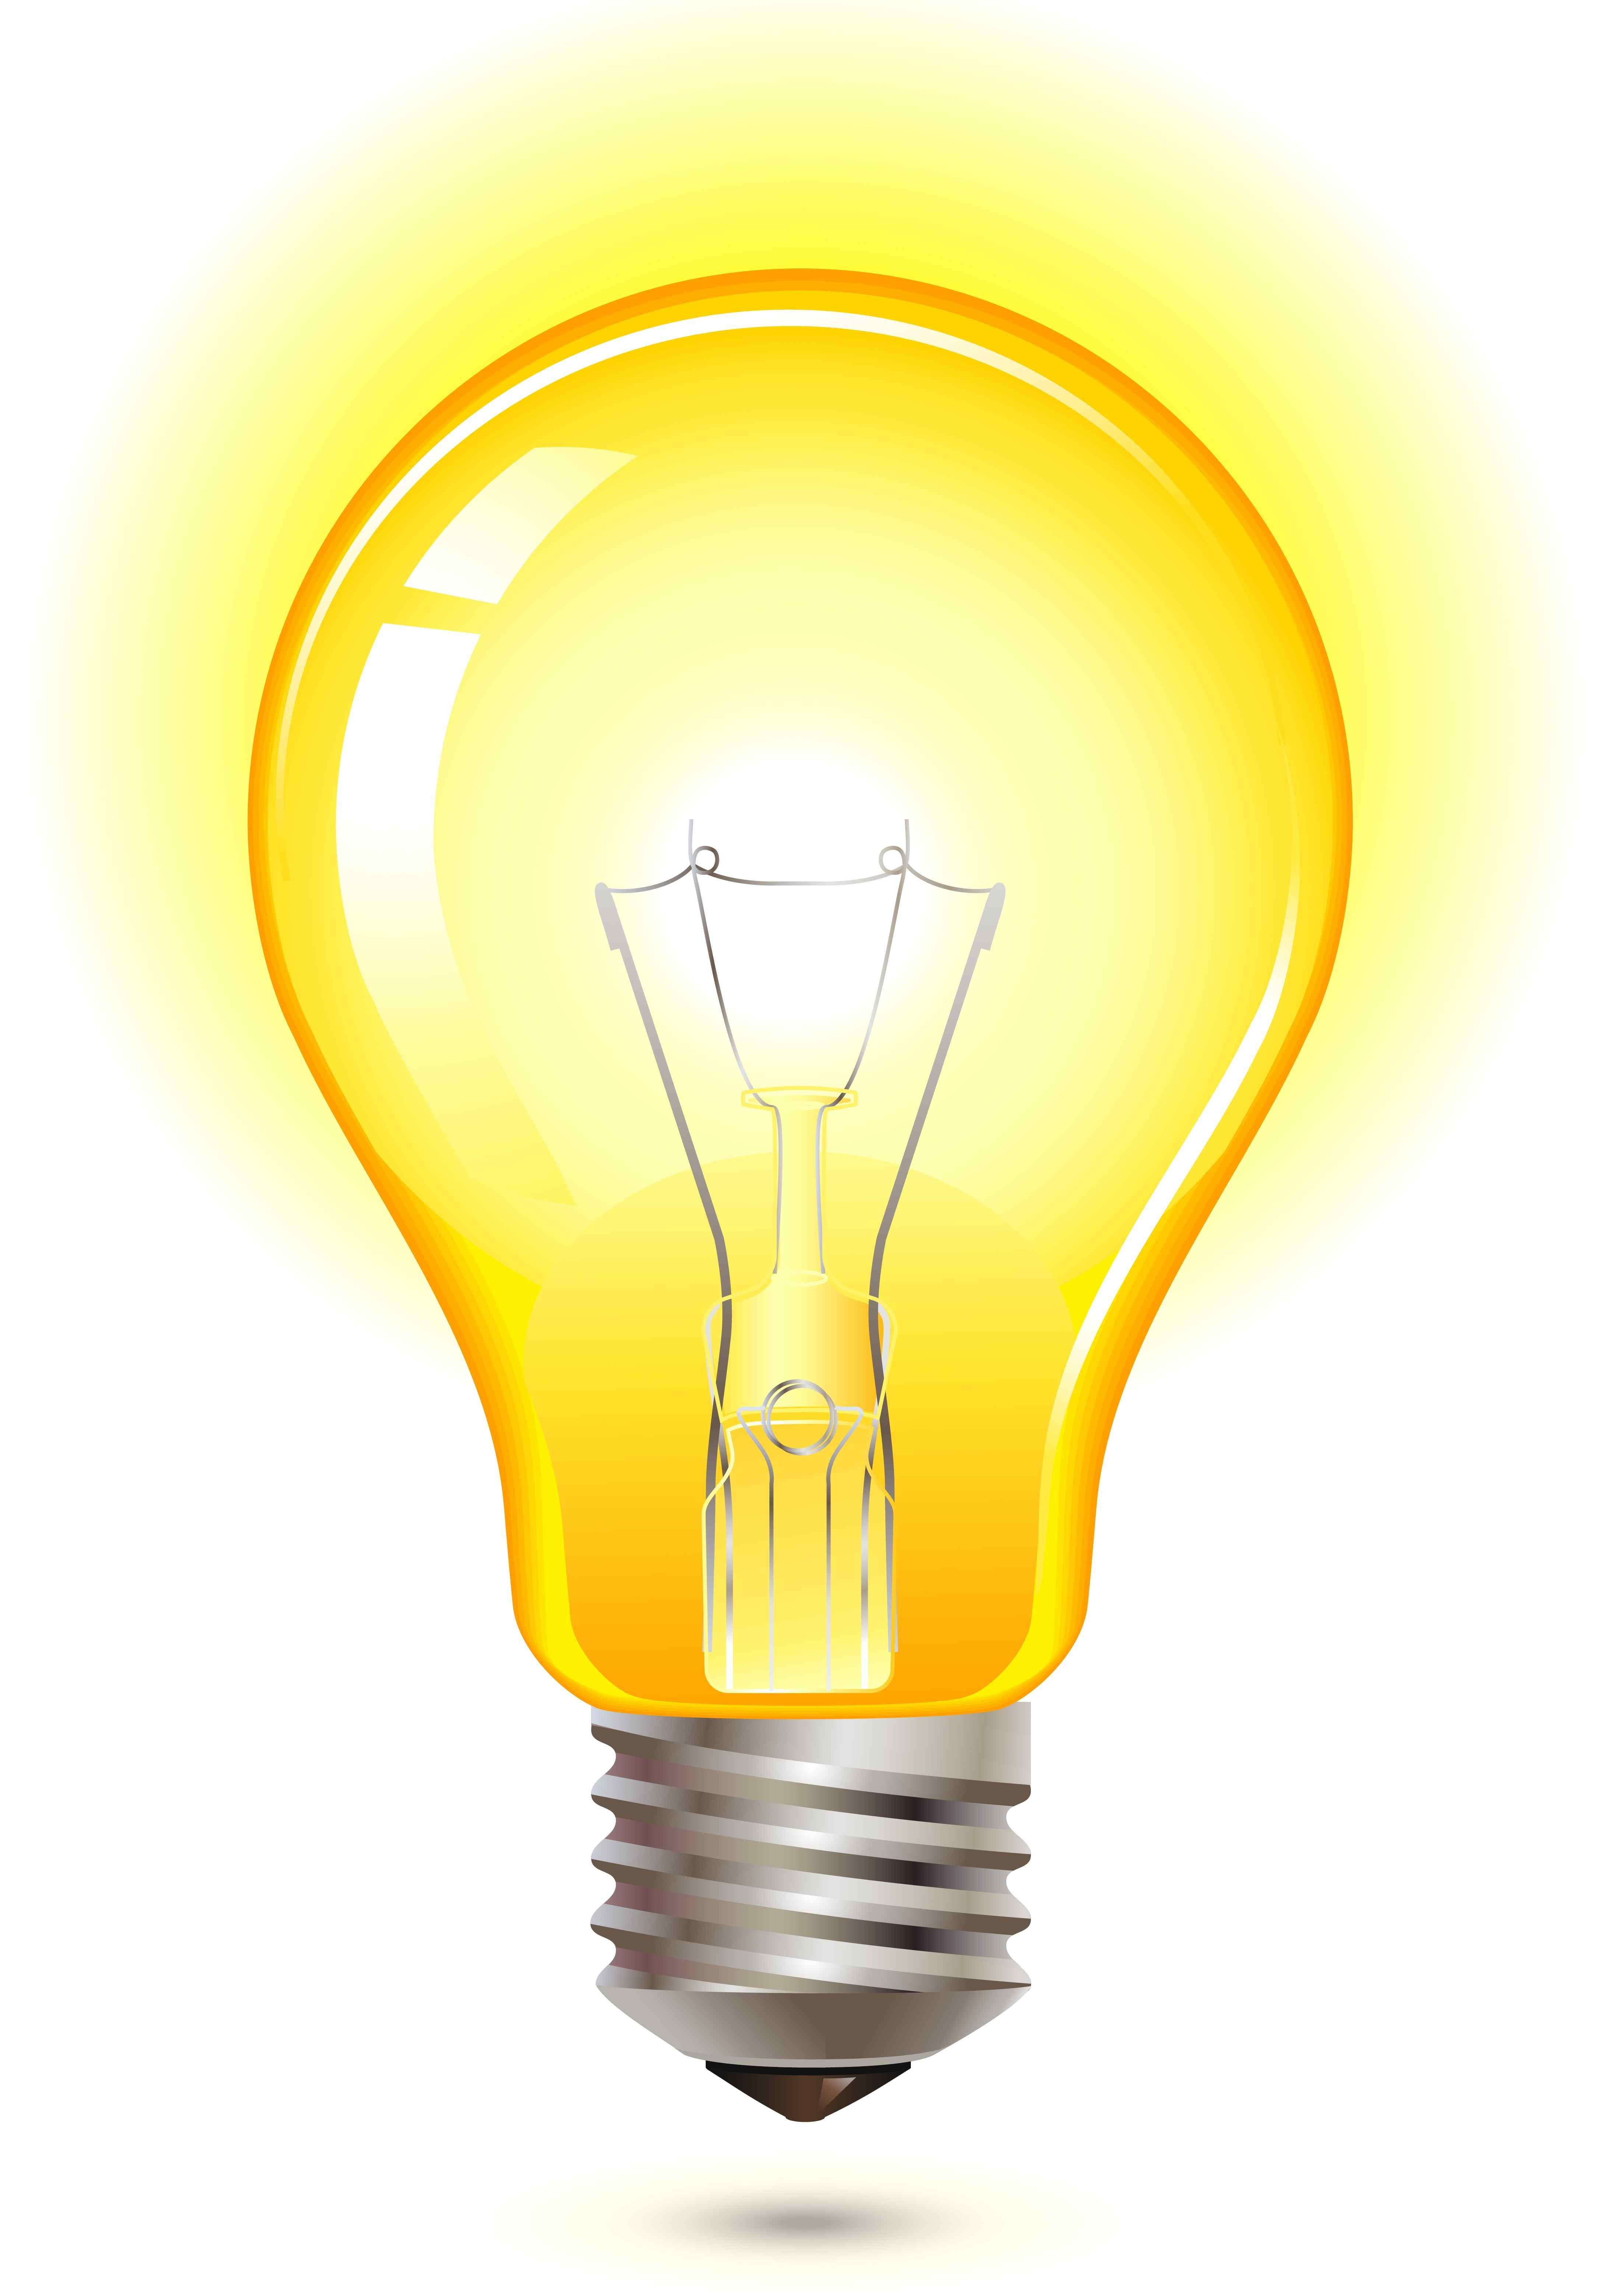 circuits on emaze for Light Bulb Animated Gif  104xkb